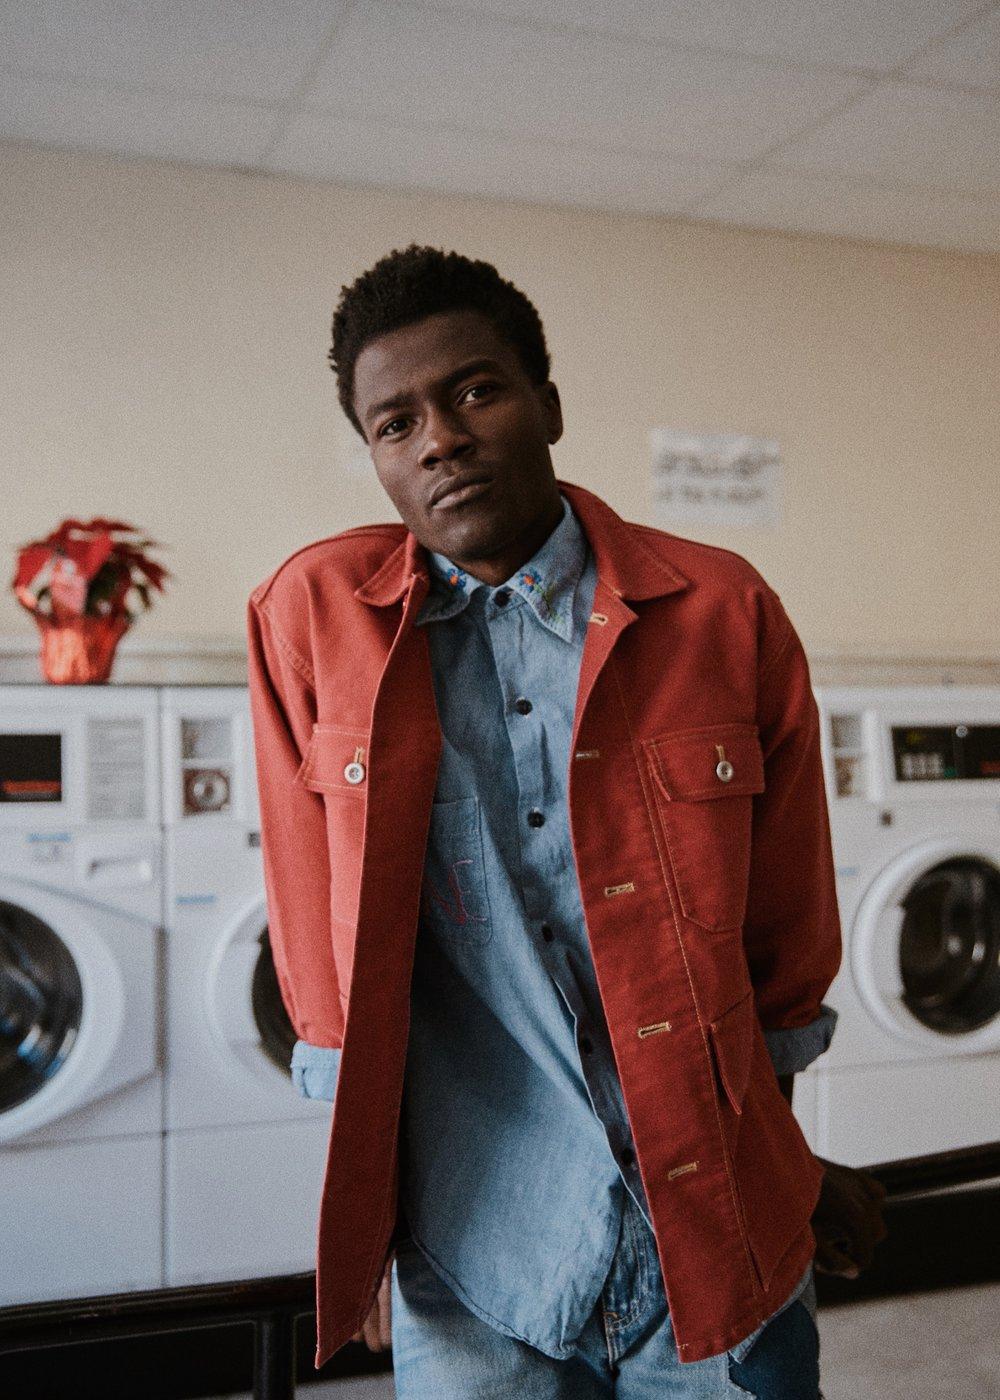 10_01_Laundromat-Arturo-Suzy-025_w.JPEG